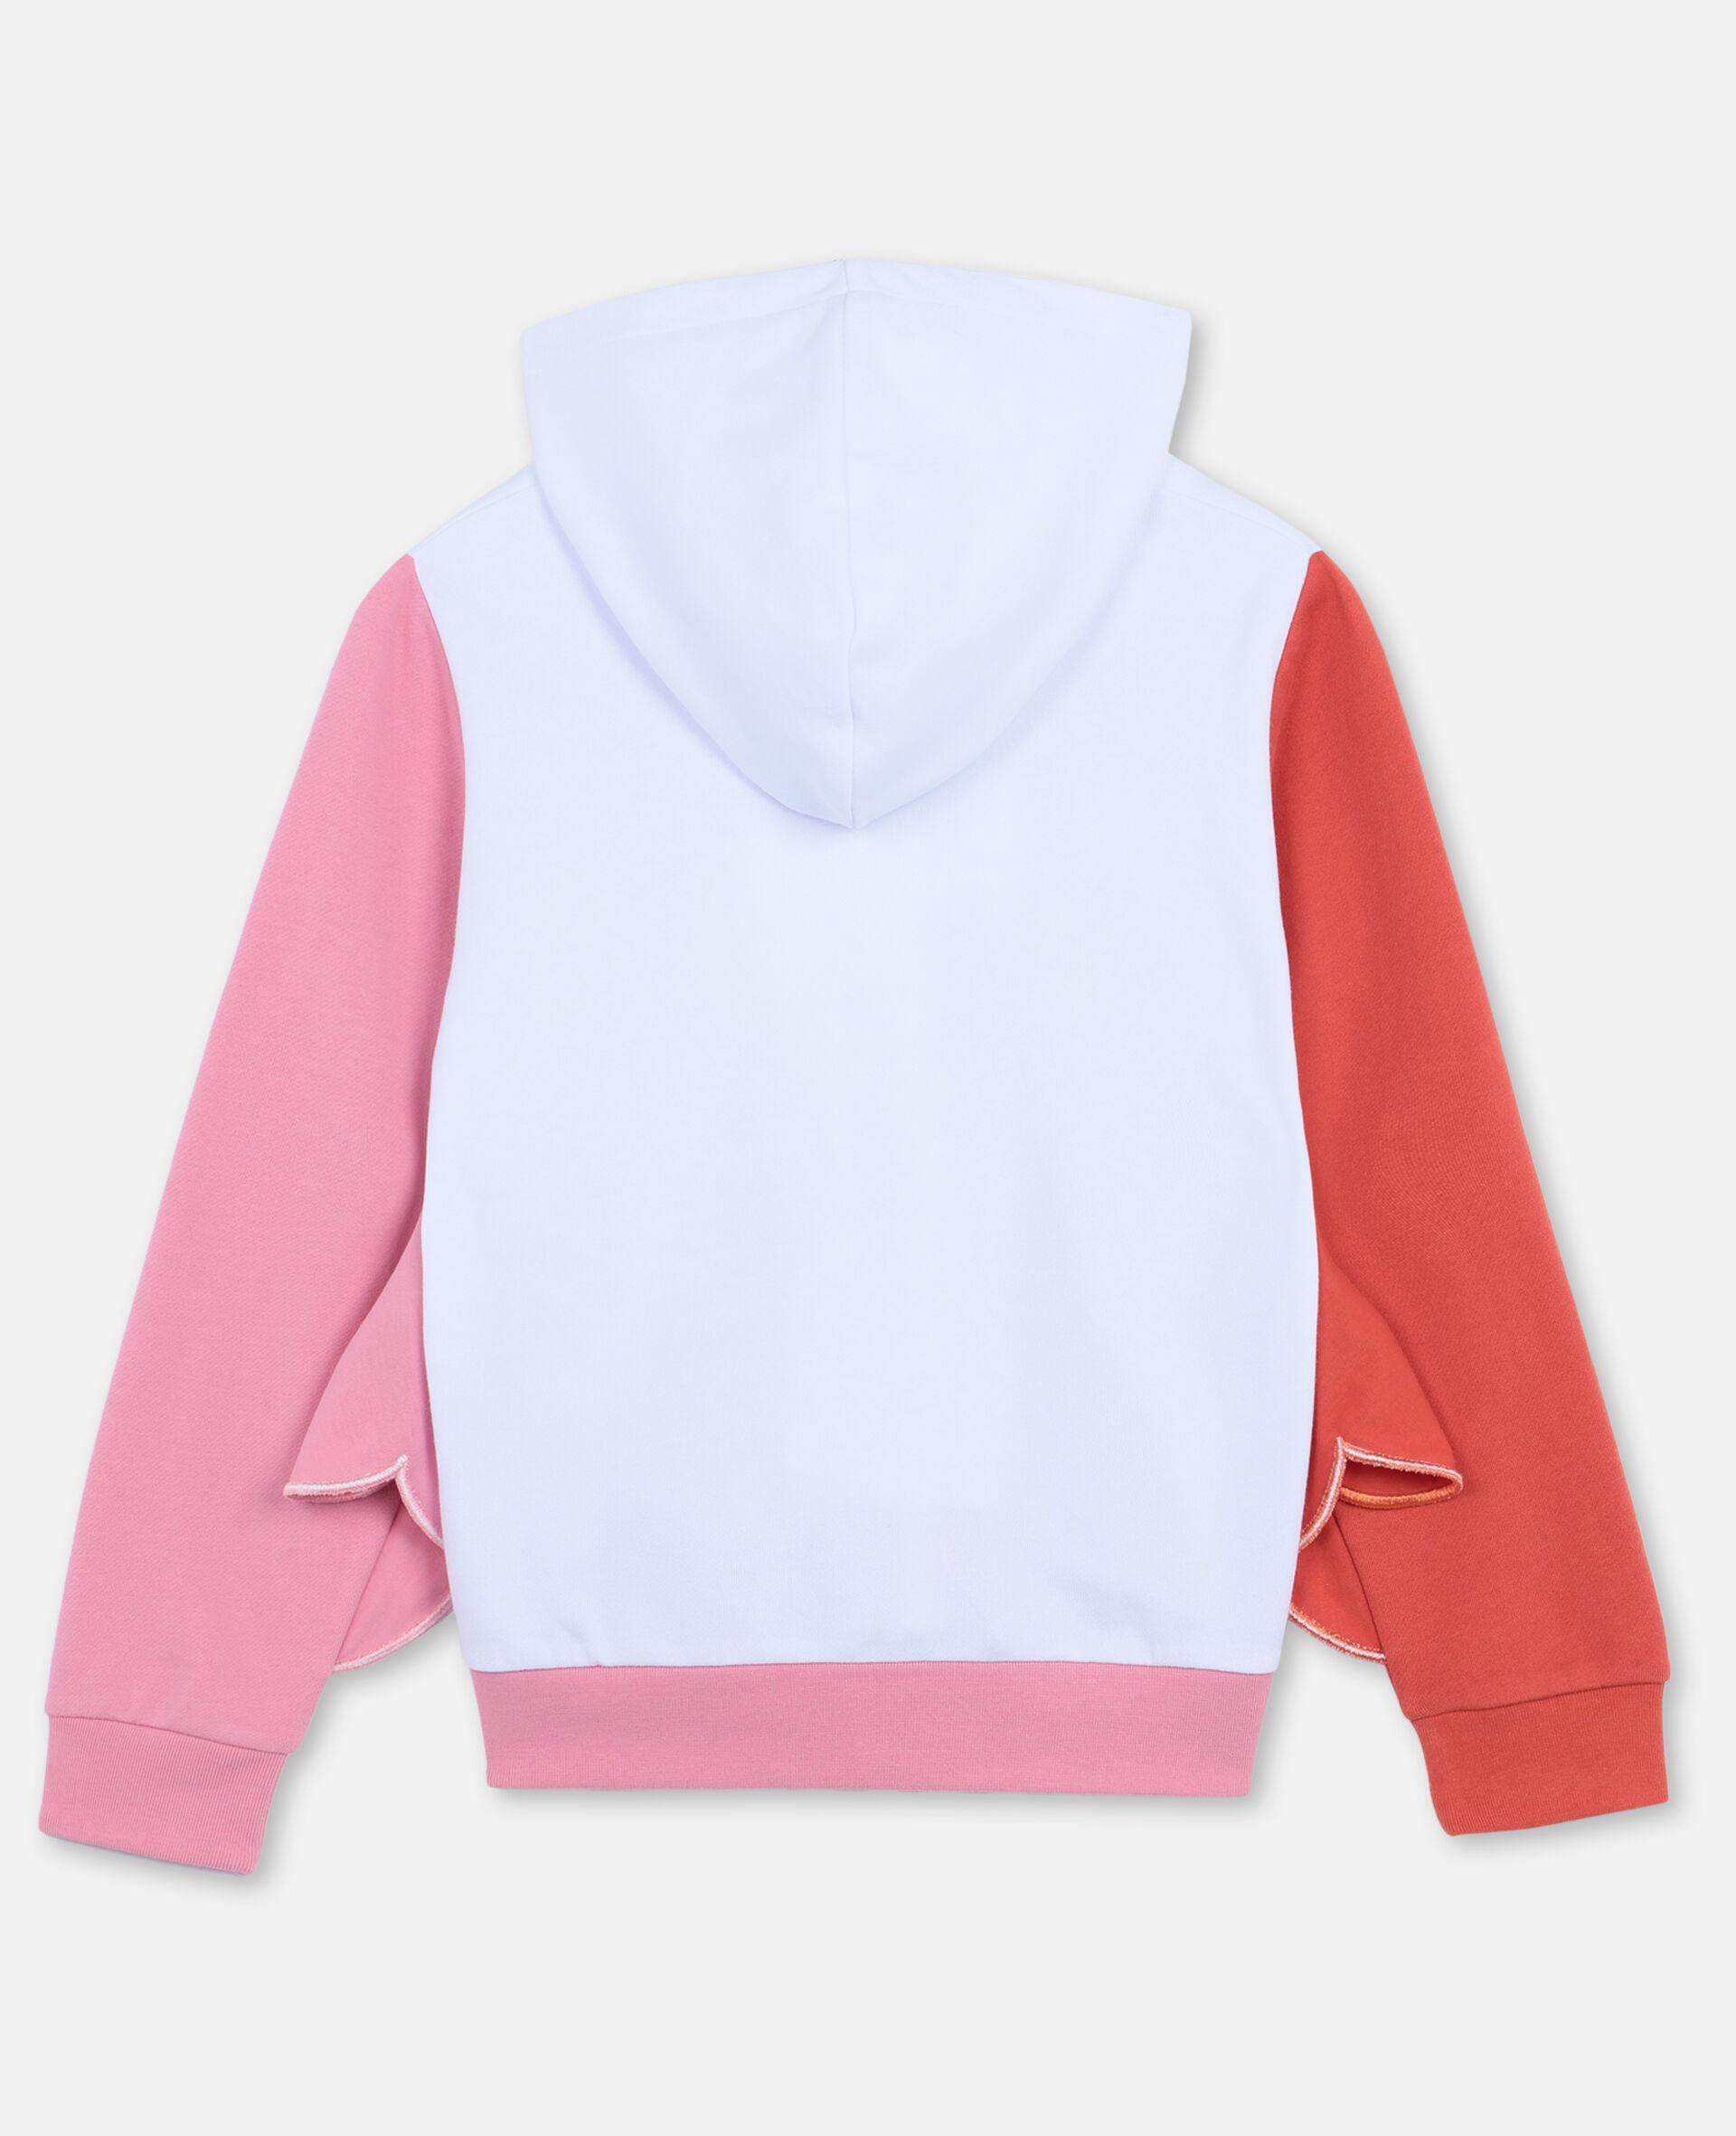 Flamingo Cotton Fleece Zip-Up Hoodie-White-large image number 3